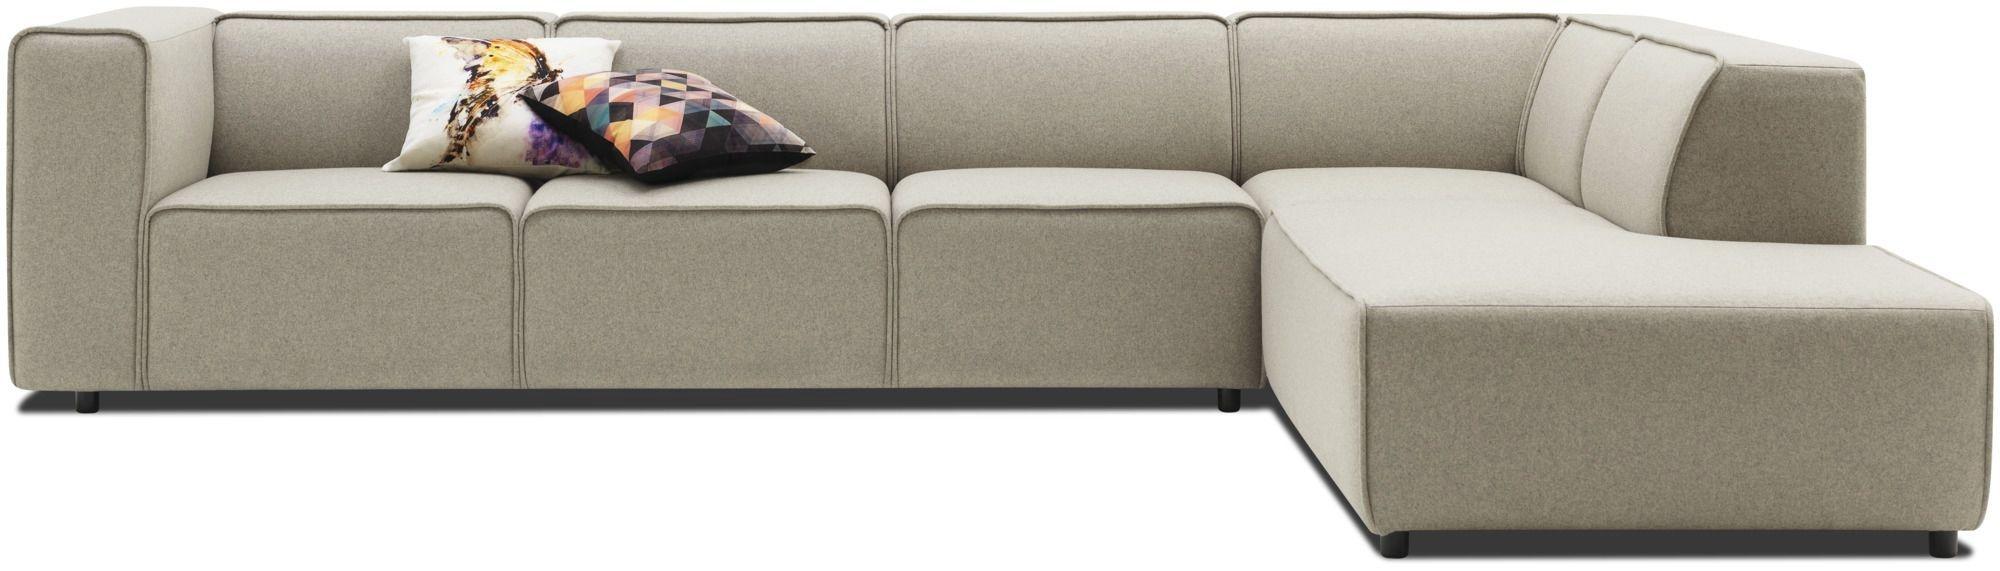 Corner Sofa Modular Contemporary Leather Carmo Anders With Regard To Modular Corner Sofas (Image 4 of 15)